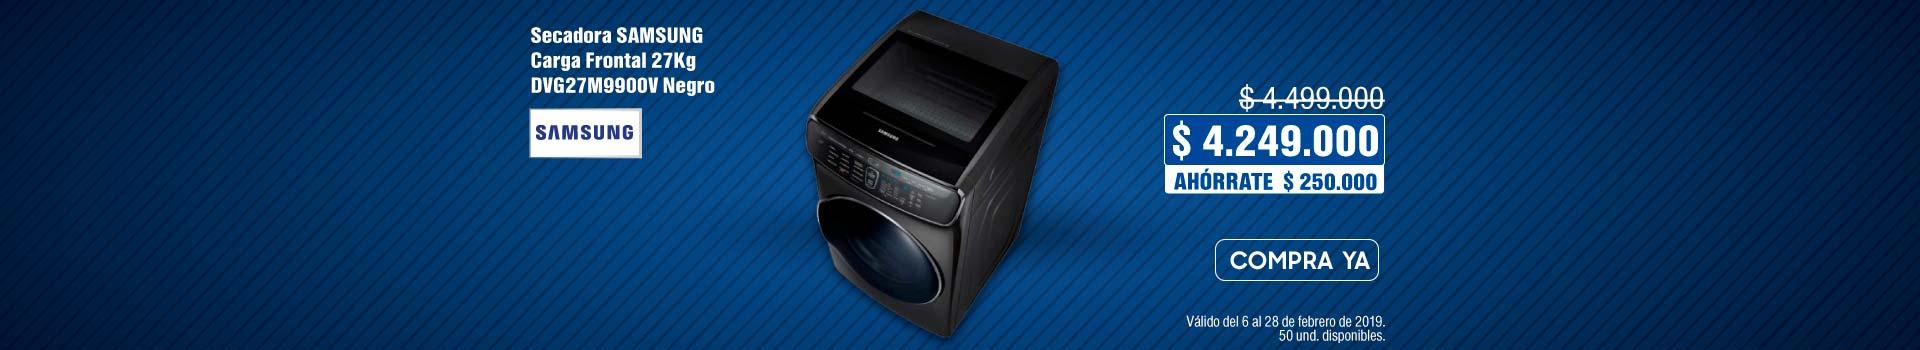 AK-KT-mayores-6-ELECT-BCAT-lavadoras-050219